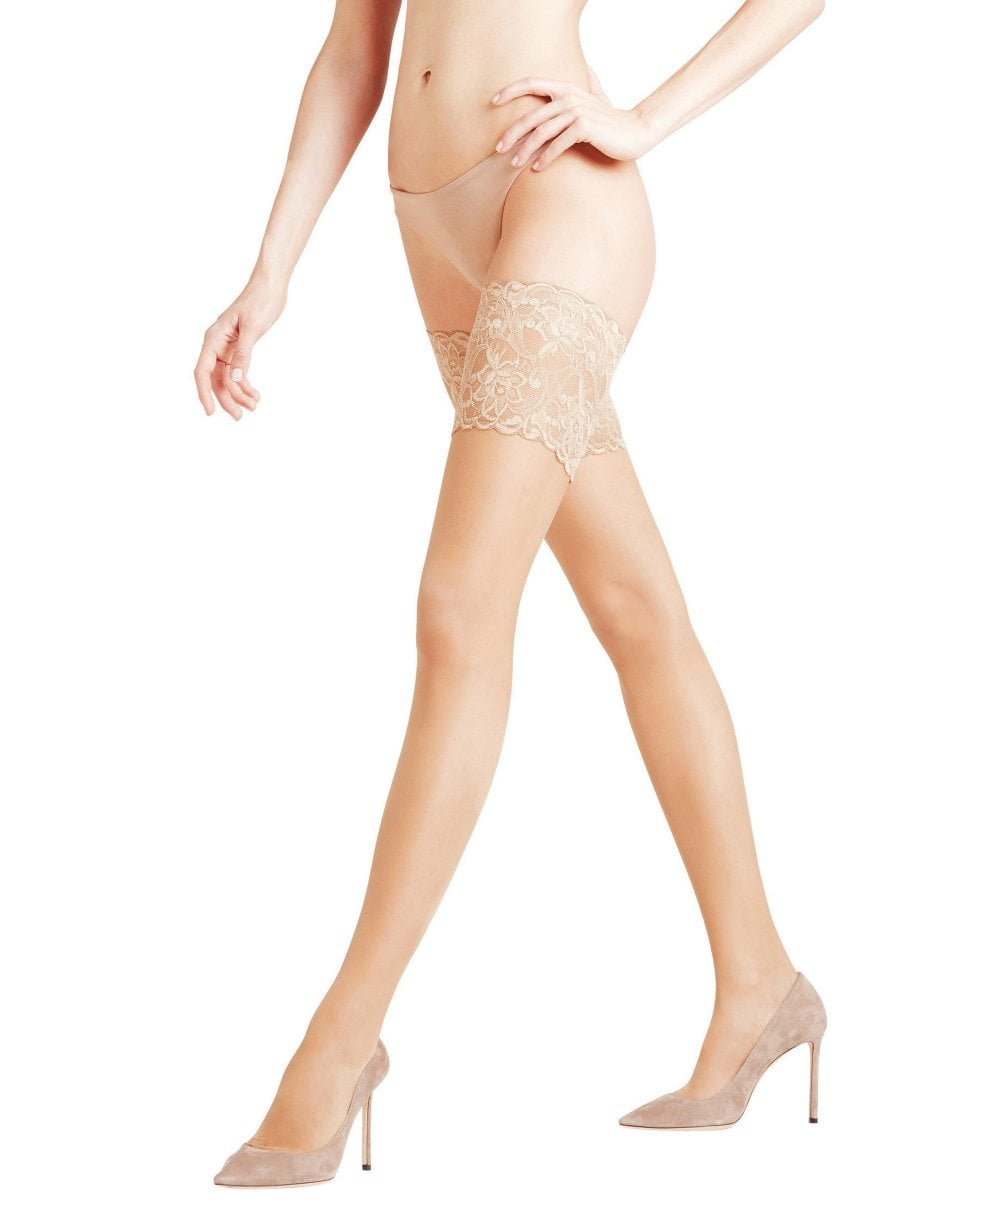 1ccdcbdcc Falke Seidenglatt 15 Deep Lace Stay Ups - Hold-Ups from luxury-legs ...